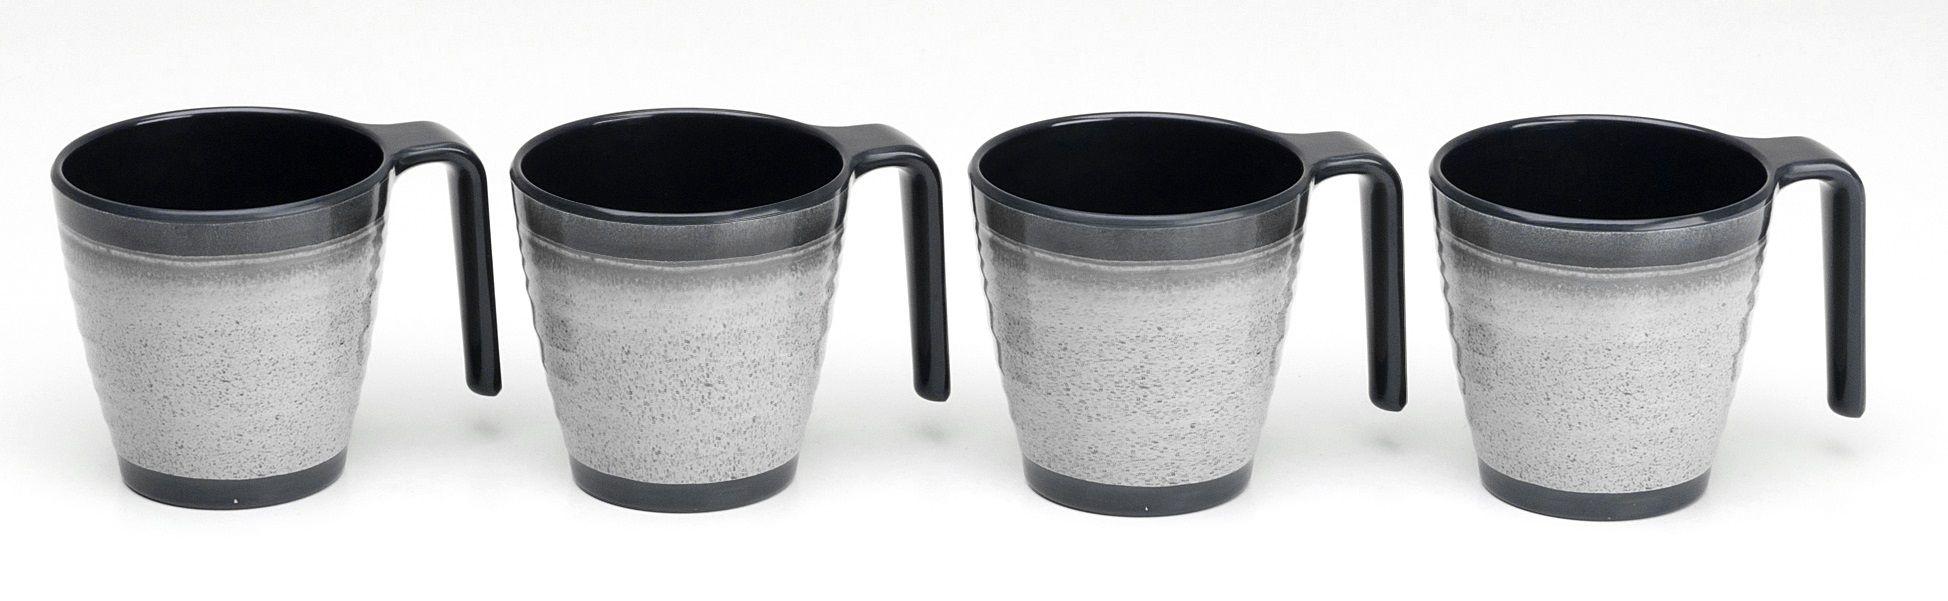 cc00bbbac5d Flamefield Granite Grey Stacking Mugs x4 - Premium Melamine (Plastic ...